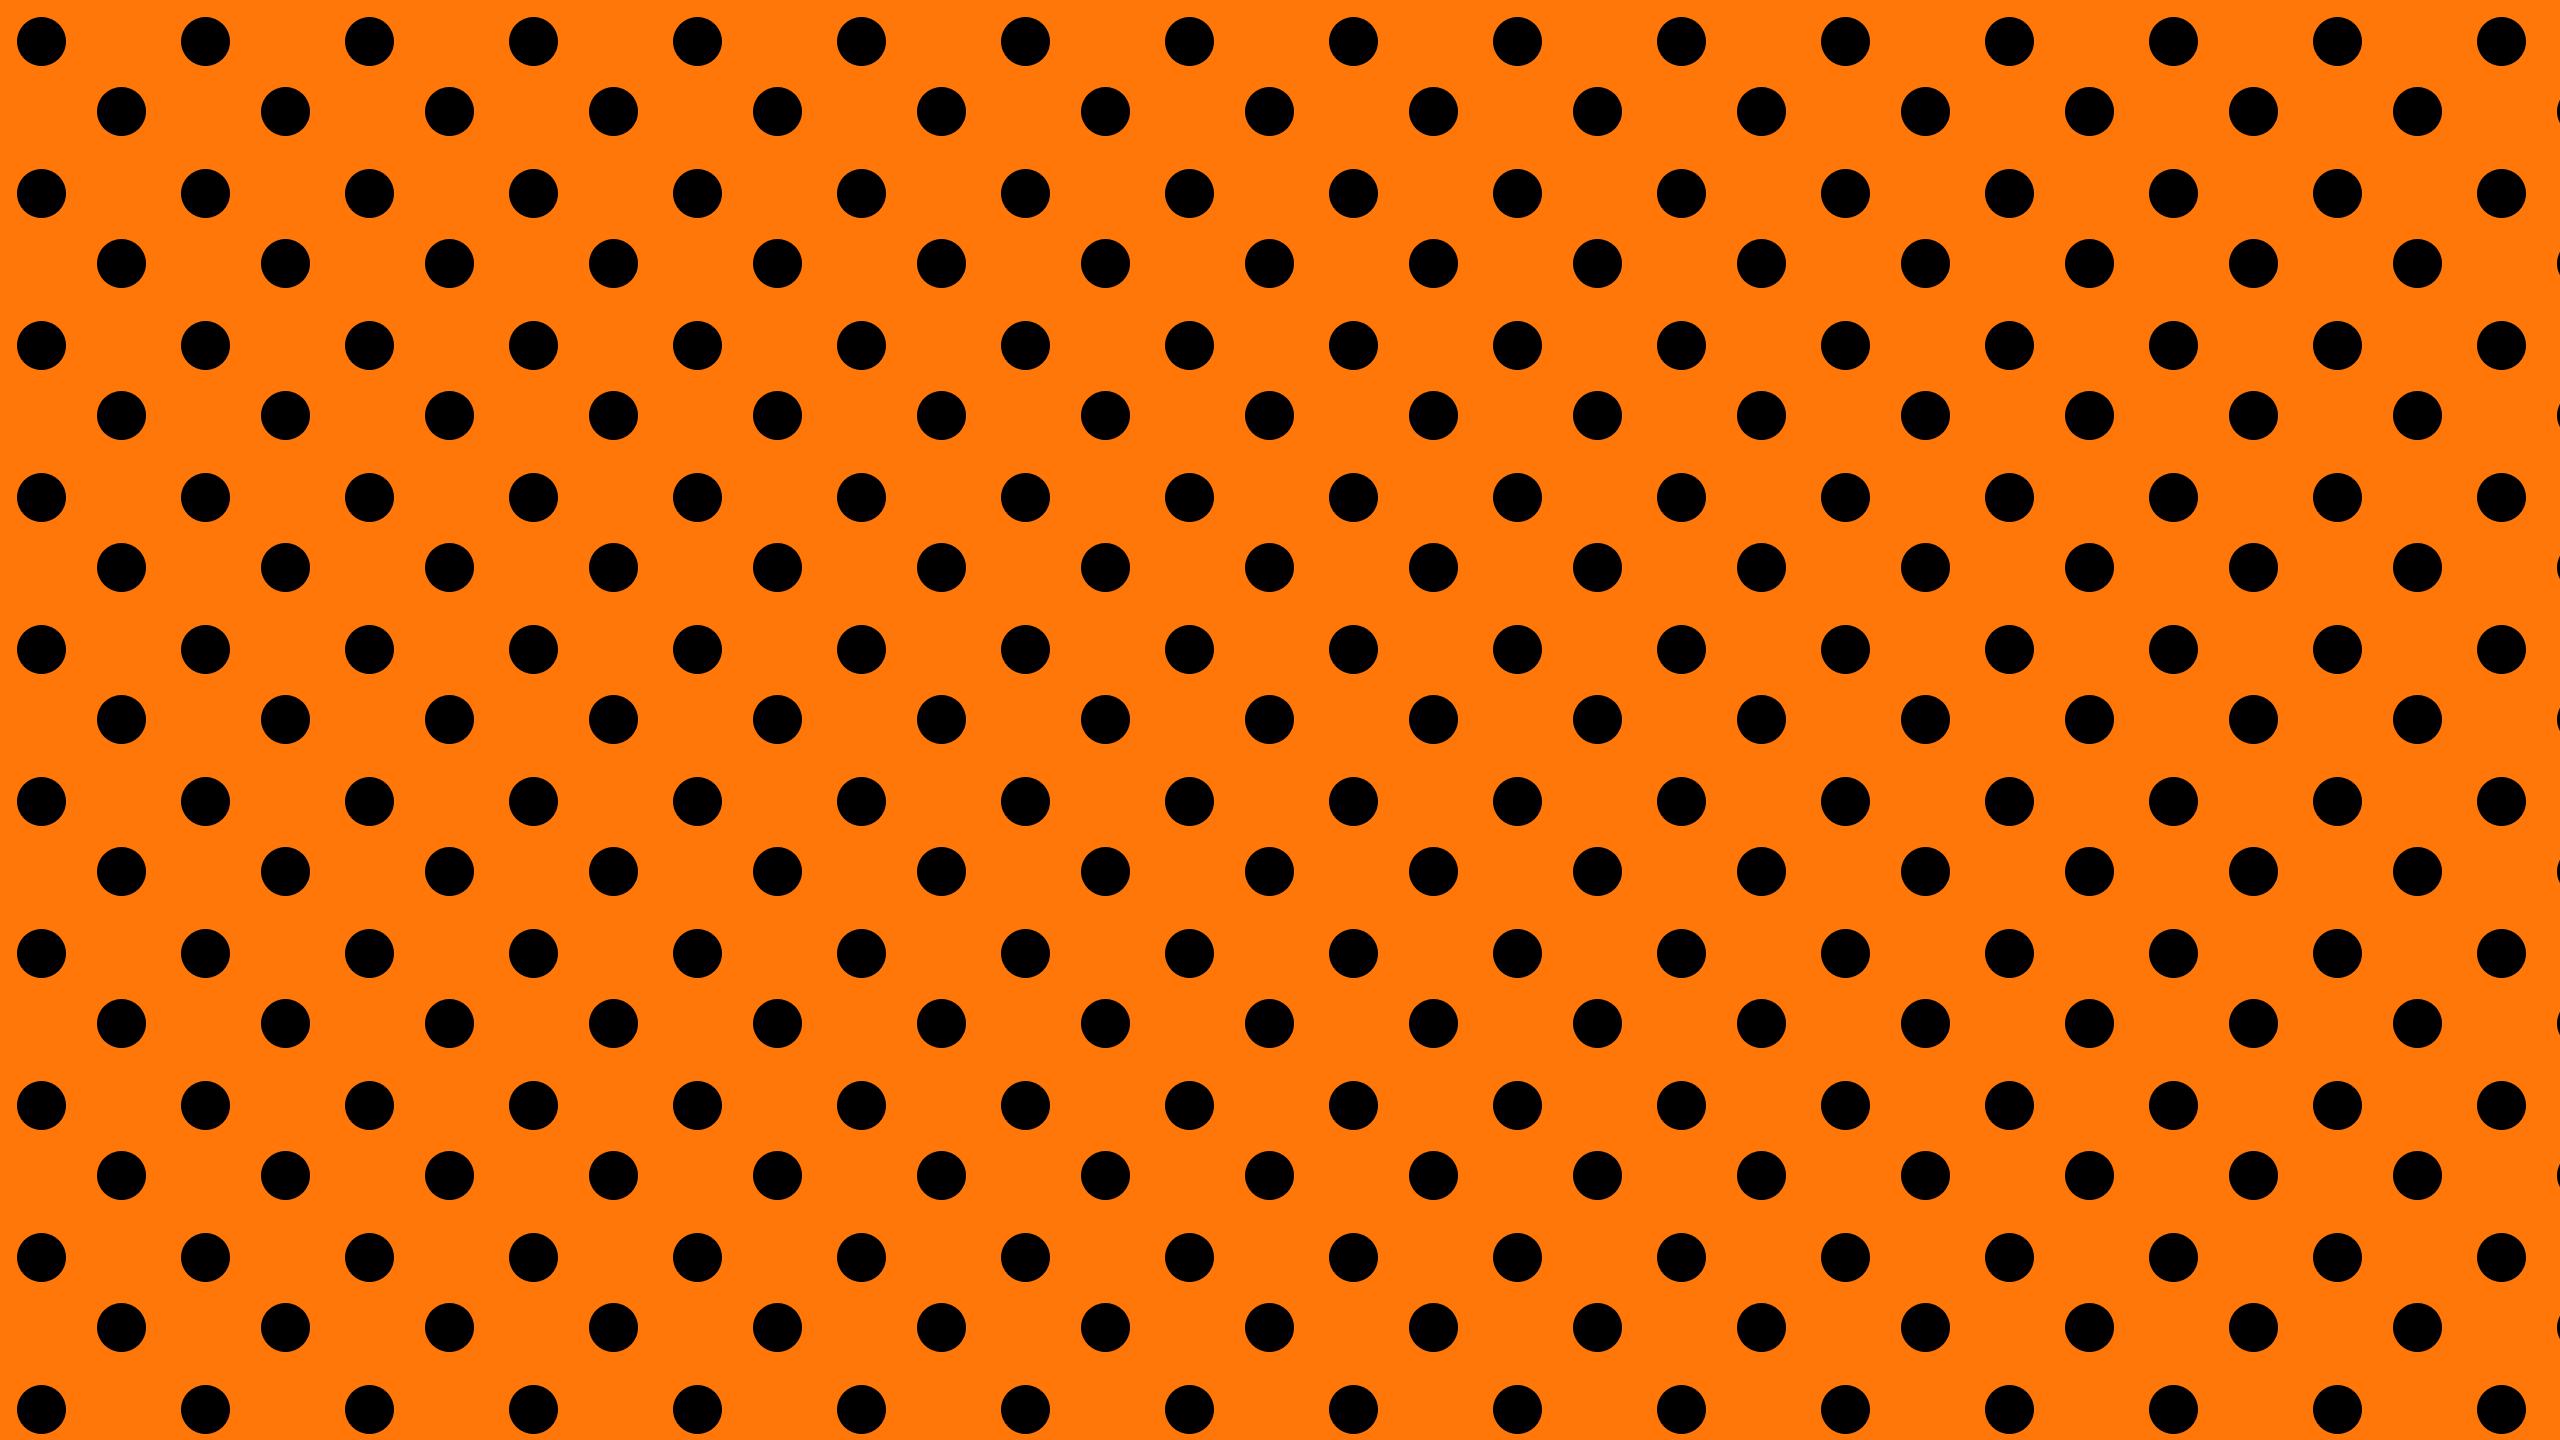 Fall Wallpaper Backgrounds Pumpkins Black And Orange Background Hd Pixelstalk Net